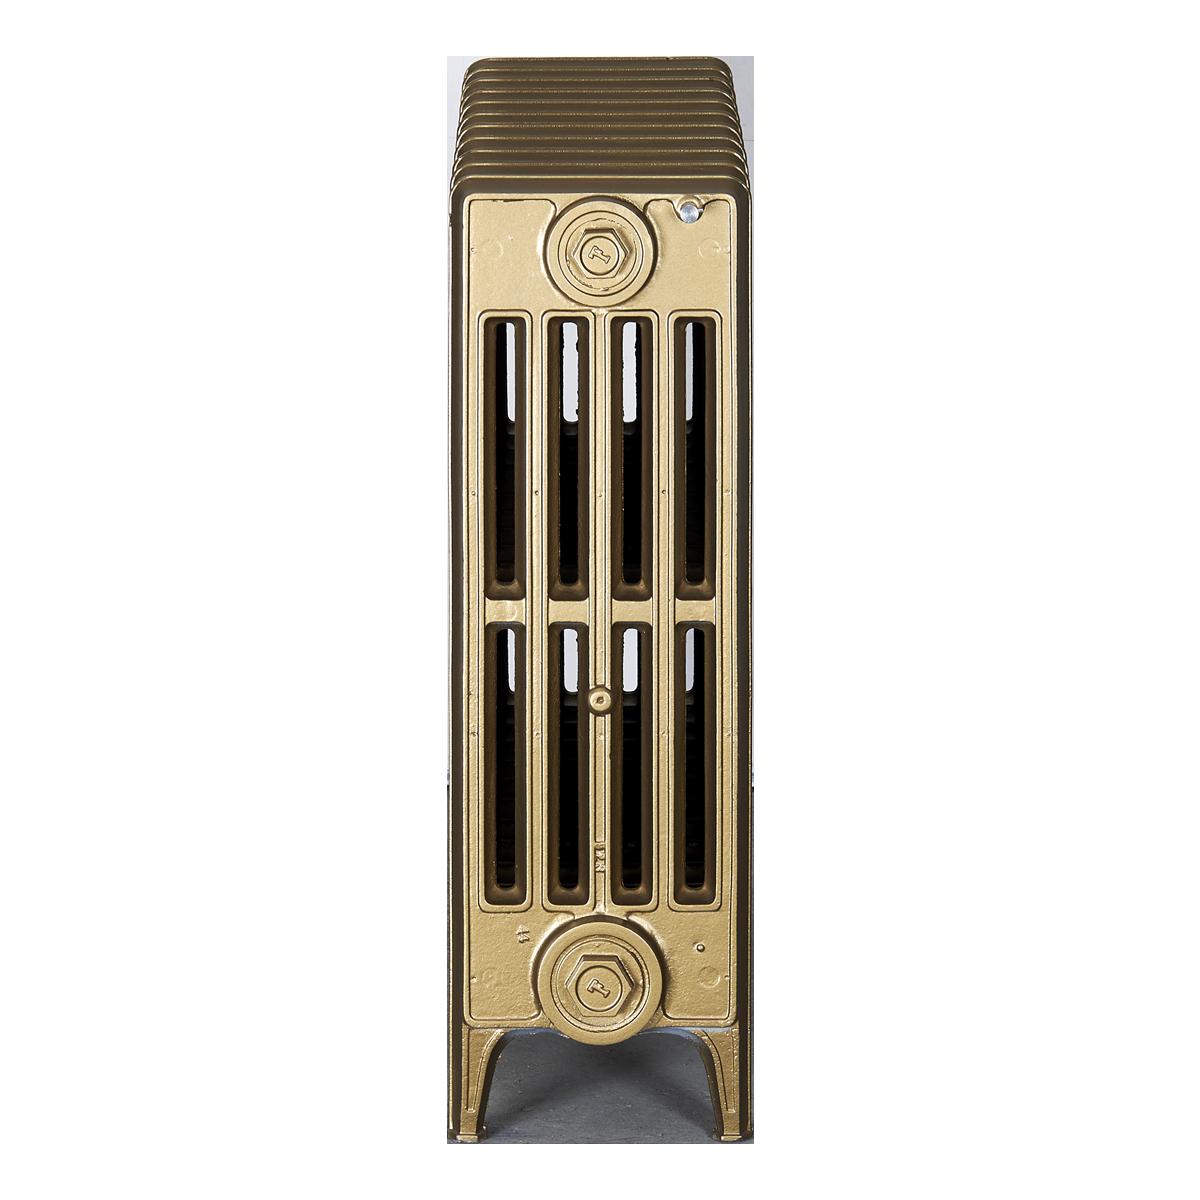 Ironworks Radiators Inc. refurbished cast iron radiator James in Brass metallic